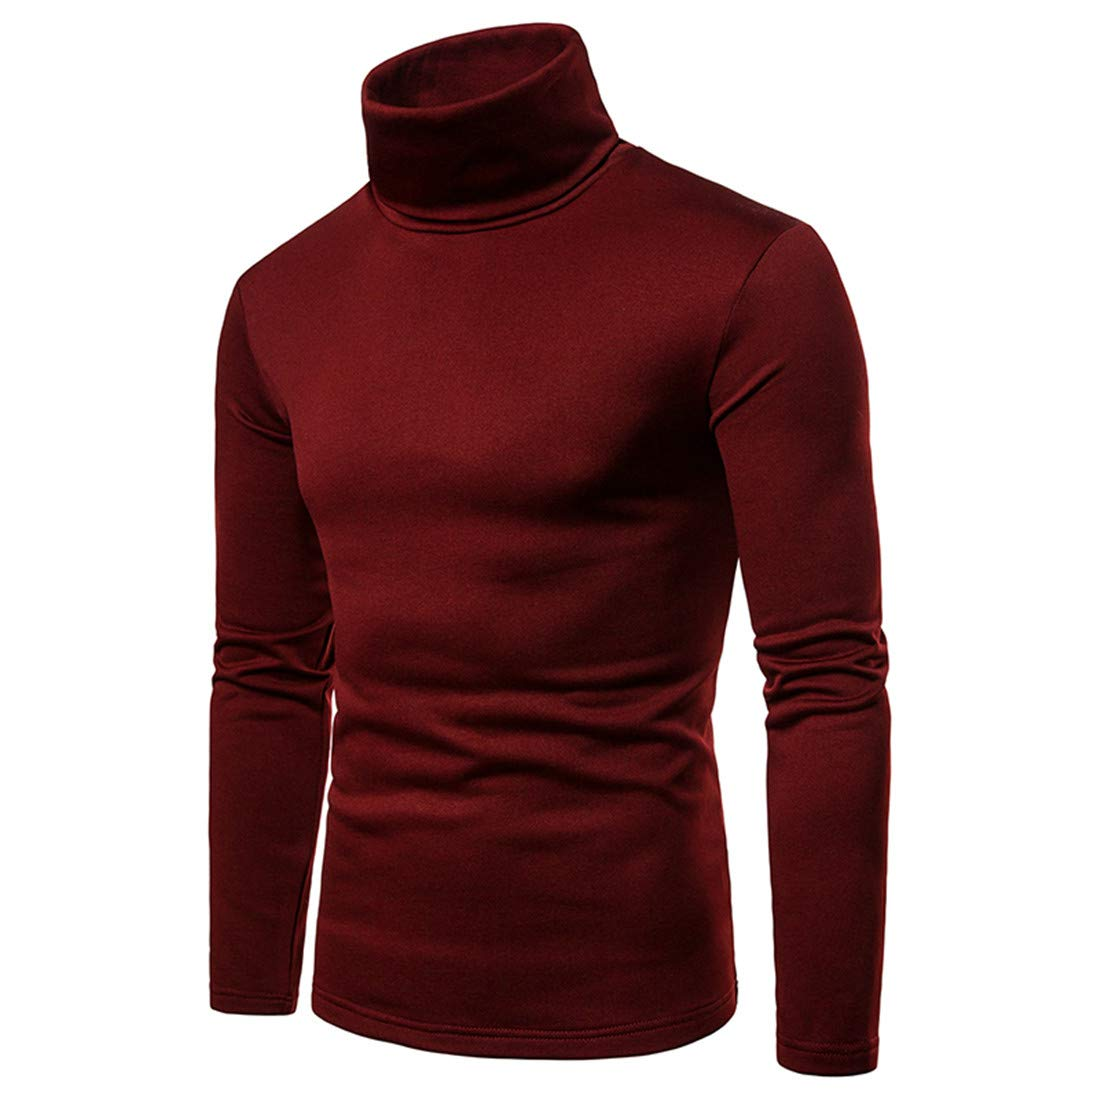 VOGMEM Men Thermal Slim Plus Size Fleece Turtleneck Long Sleeve Solid T-Shirt Tee